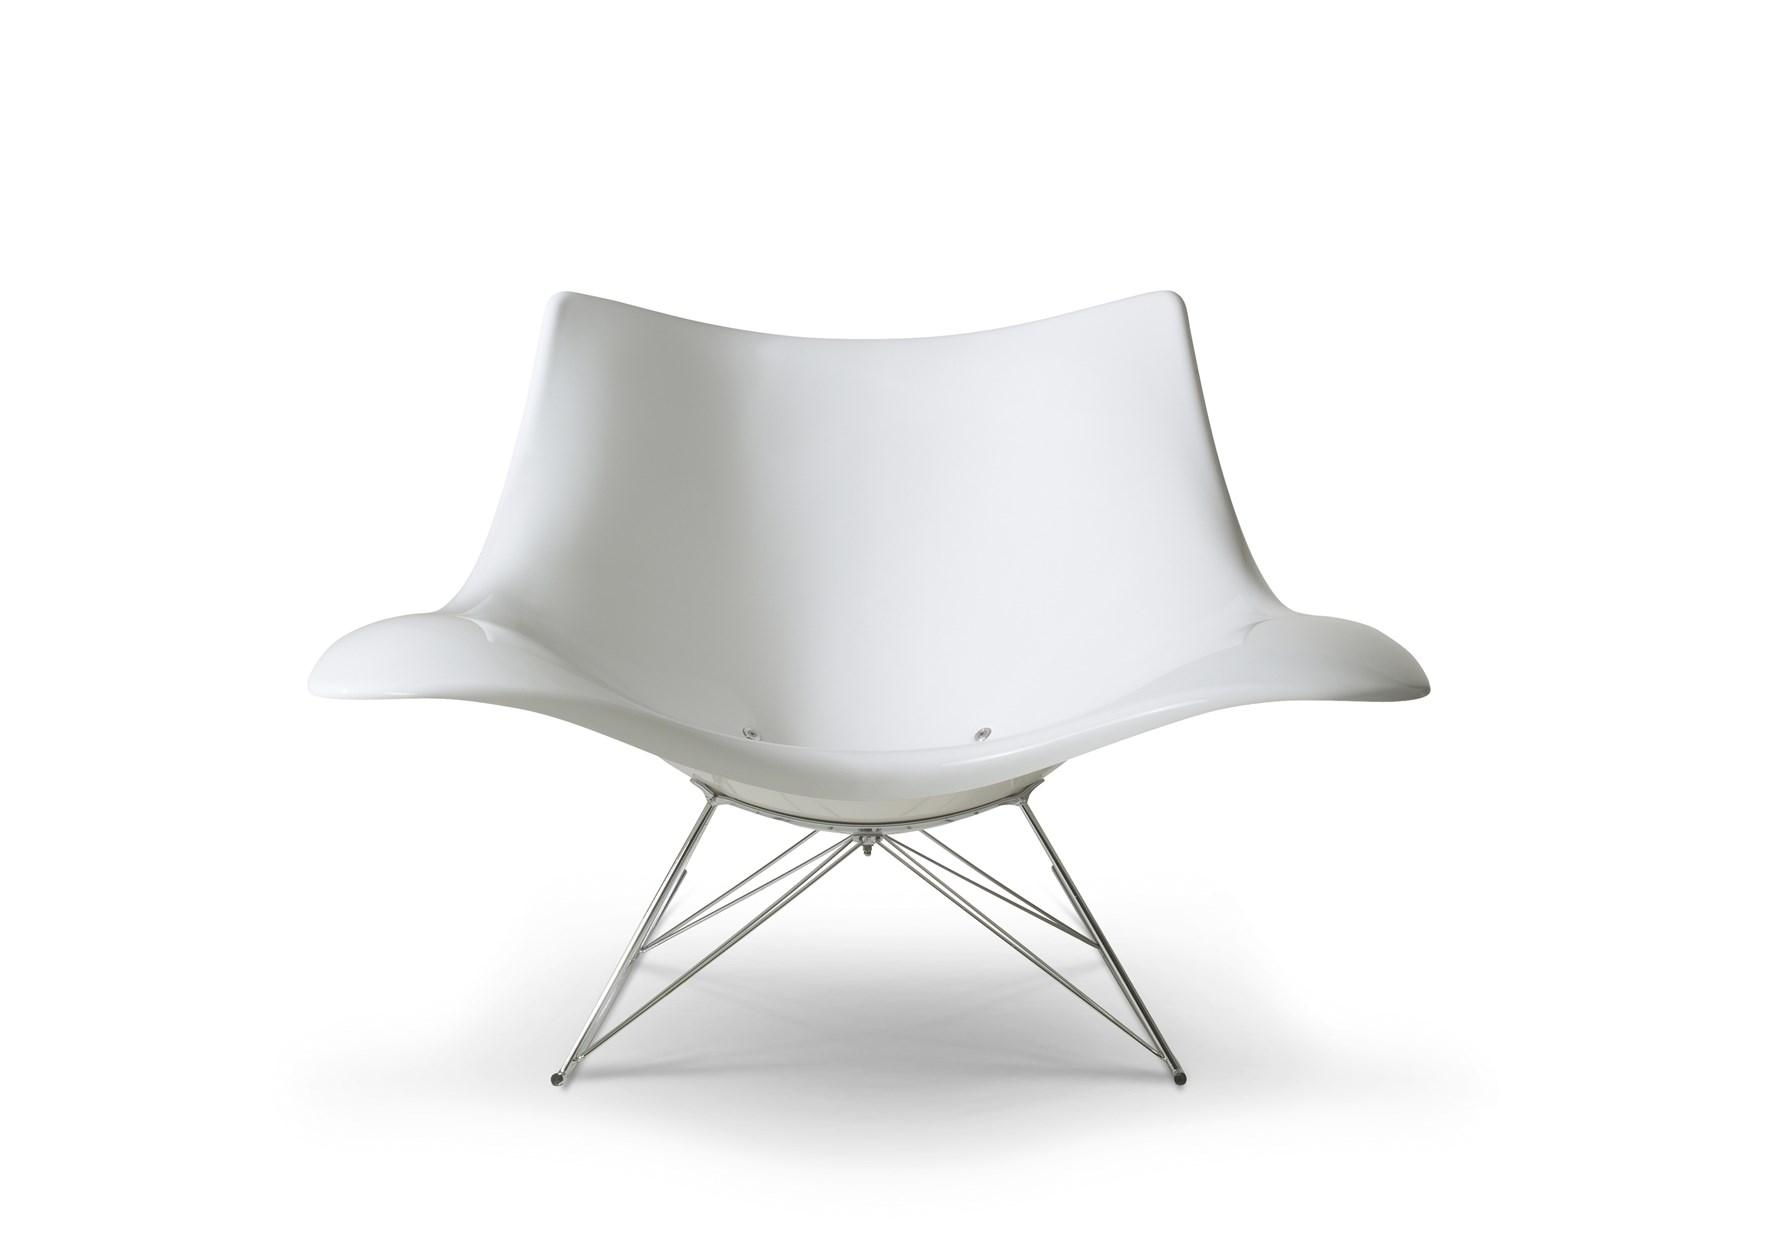 Stingray Rocking Chair Design Thomas Pedersen Voor Fredericia